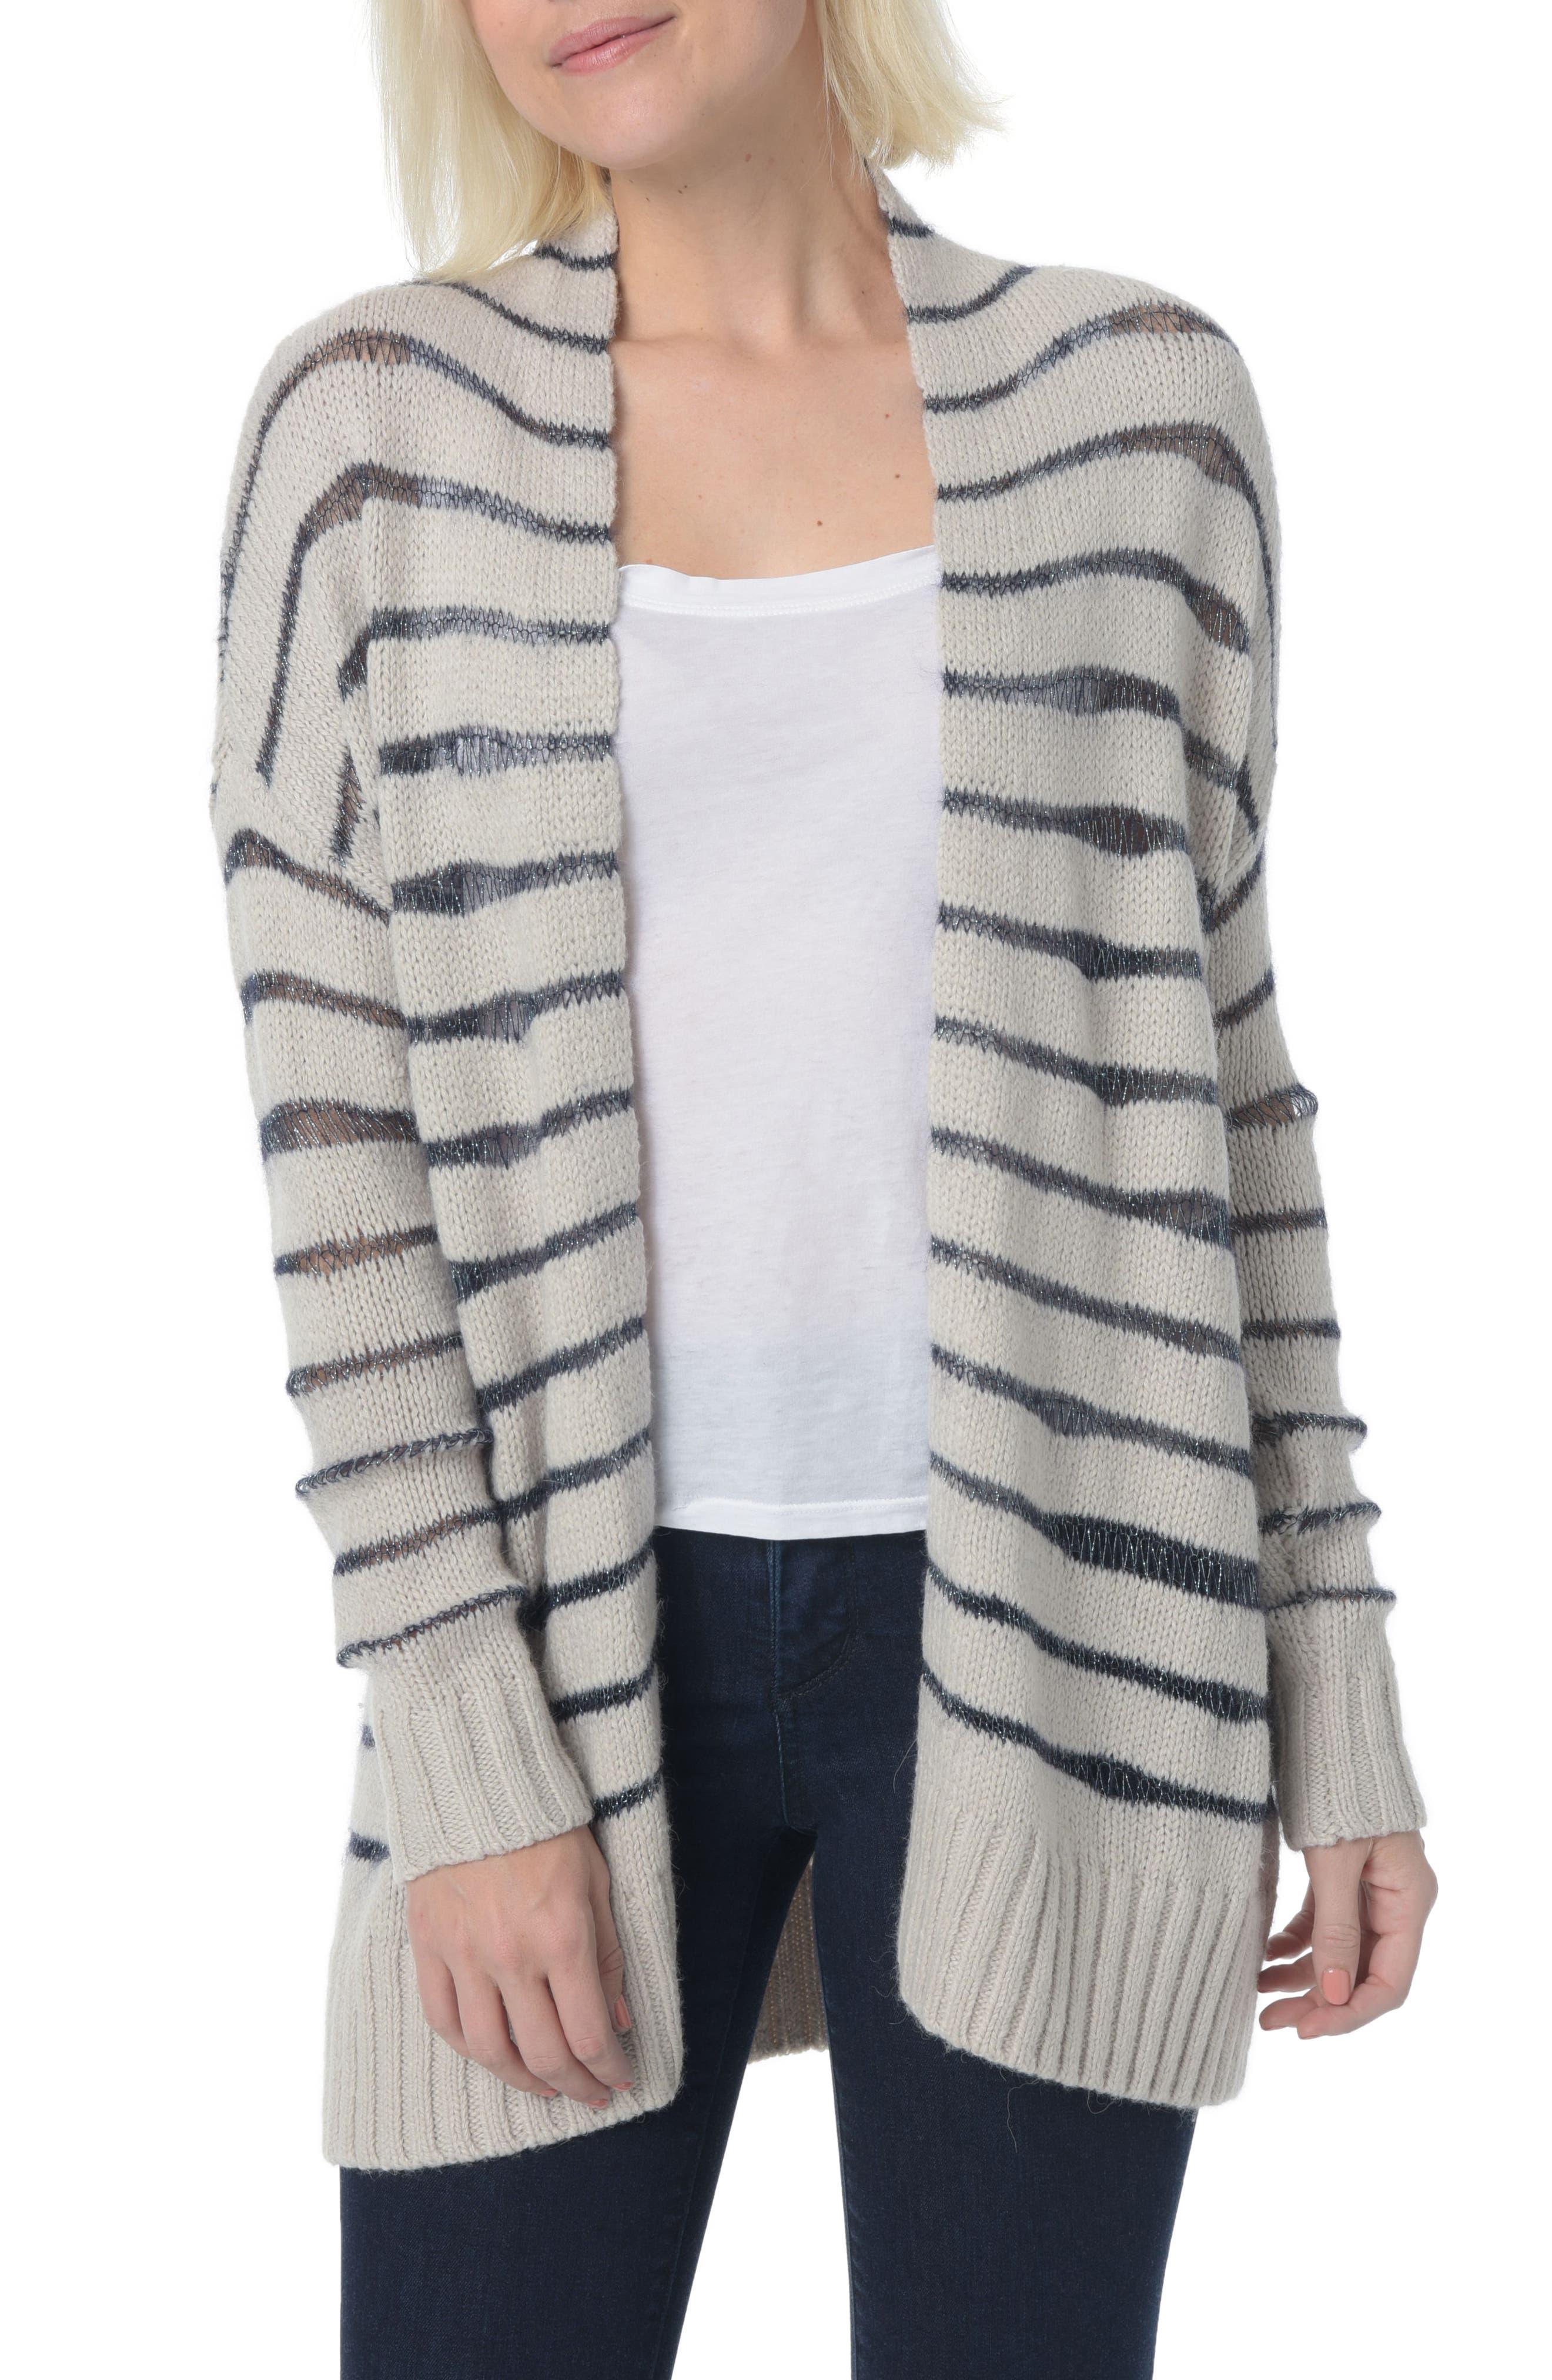 Alternate Image 1 Selected - NYDJ Metallic Striped Cardigan